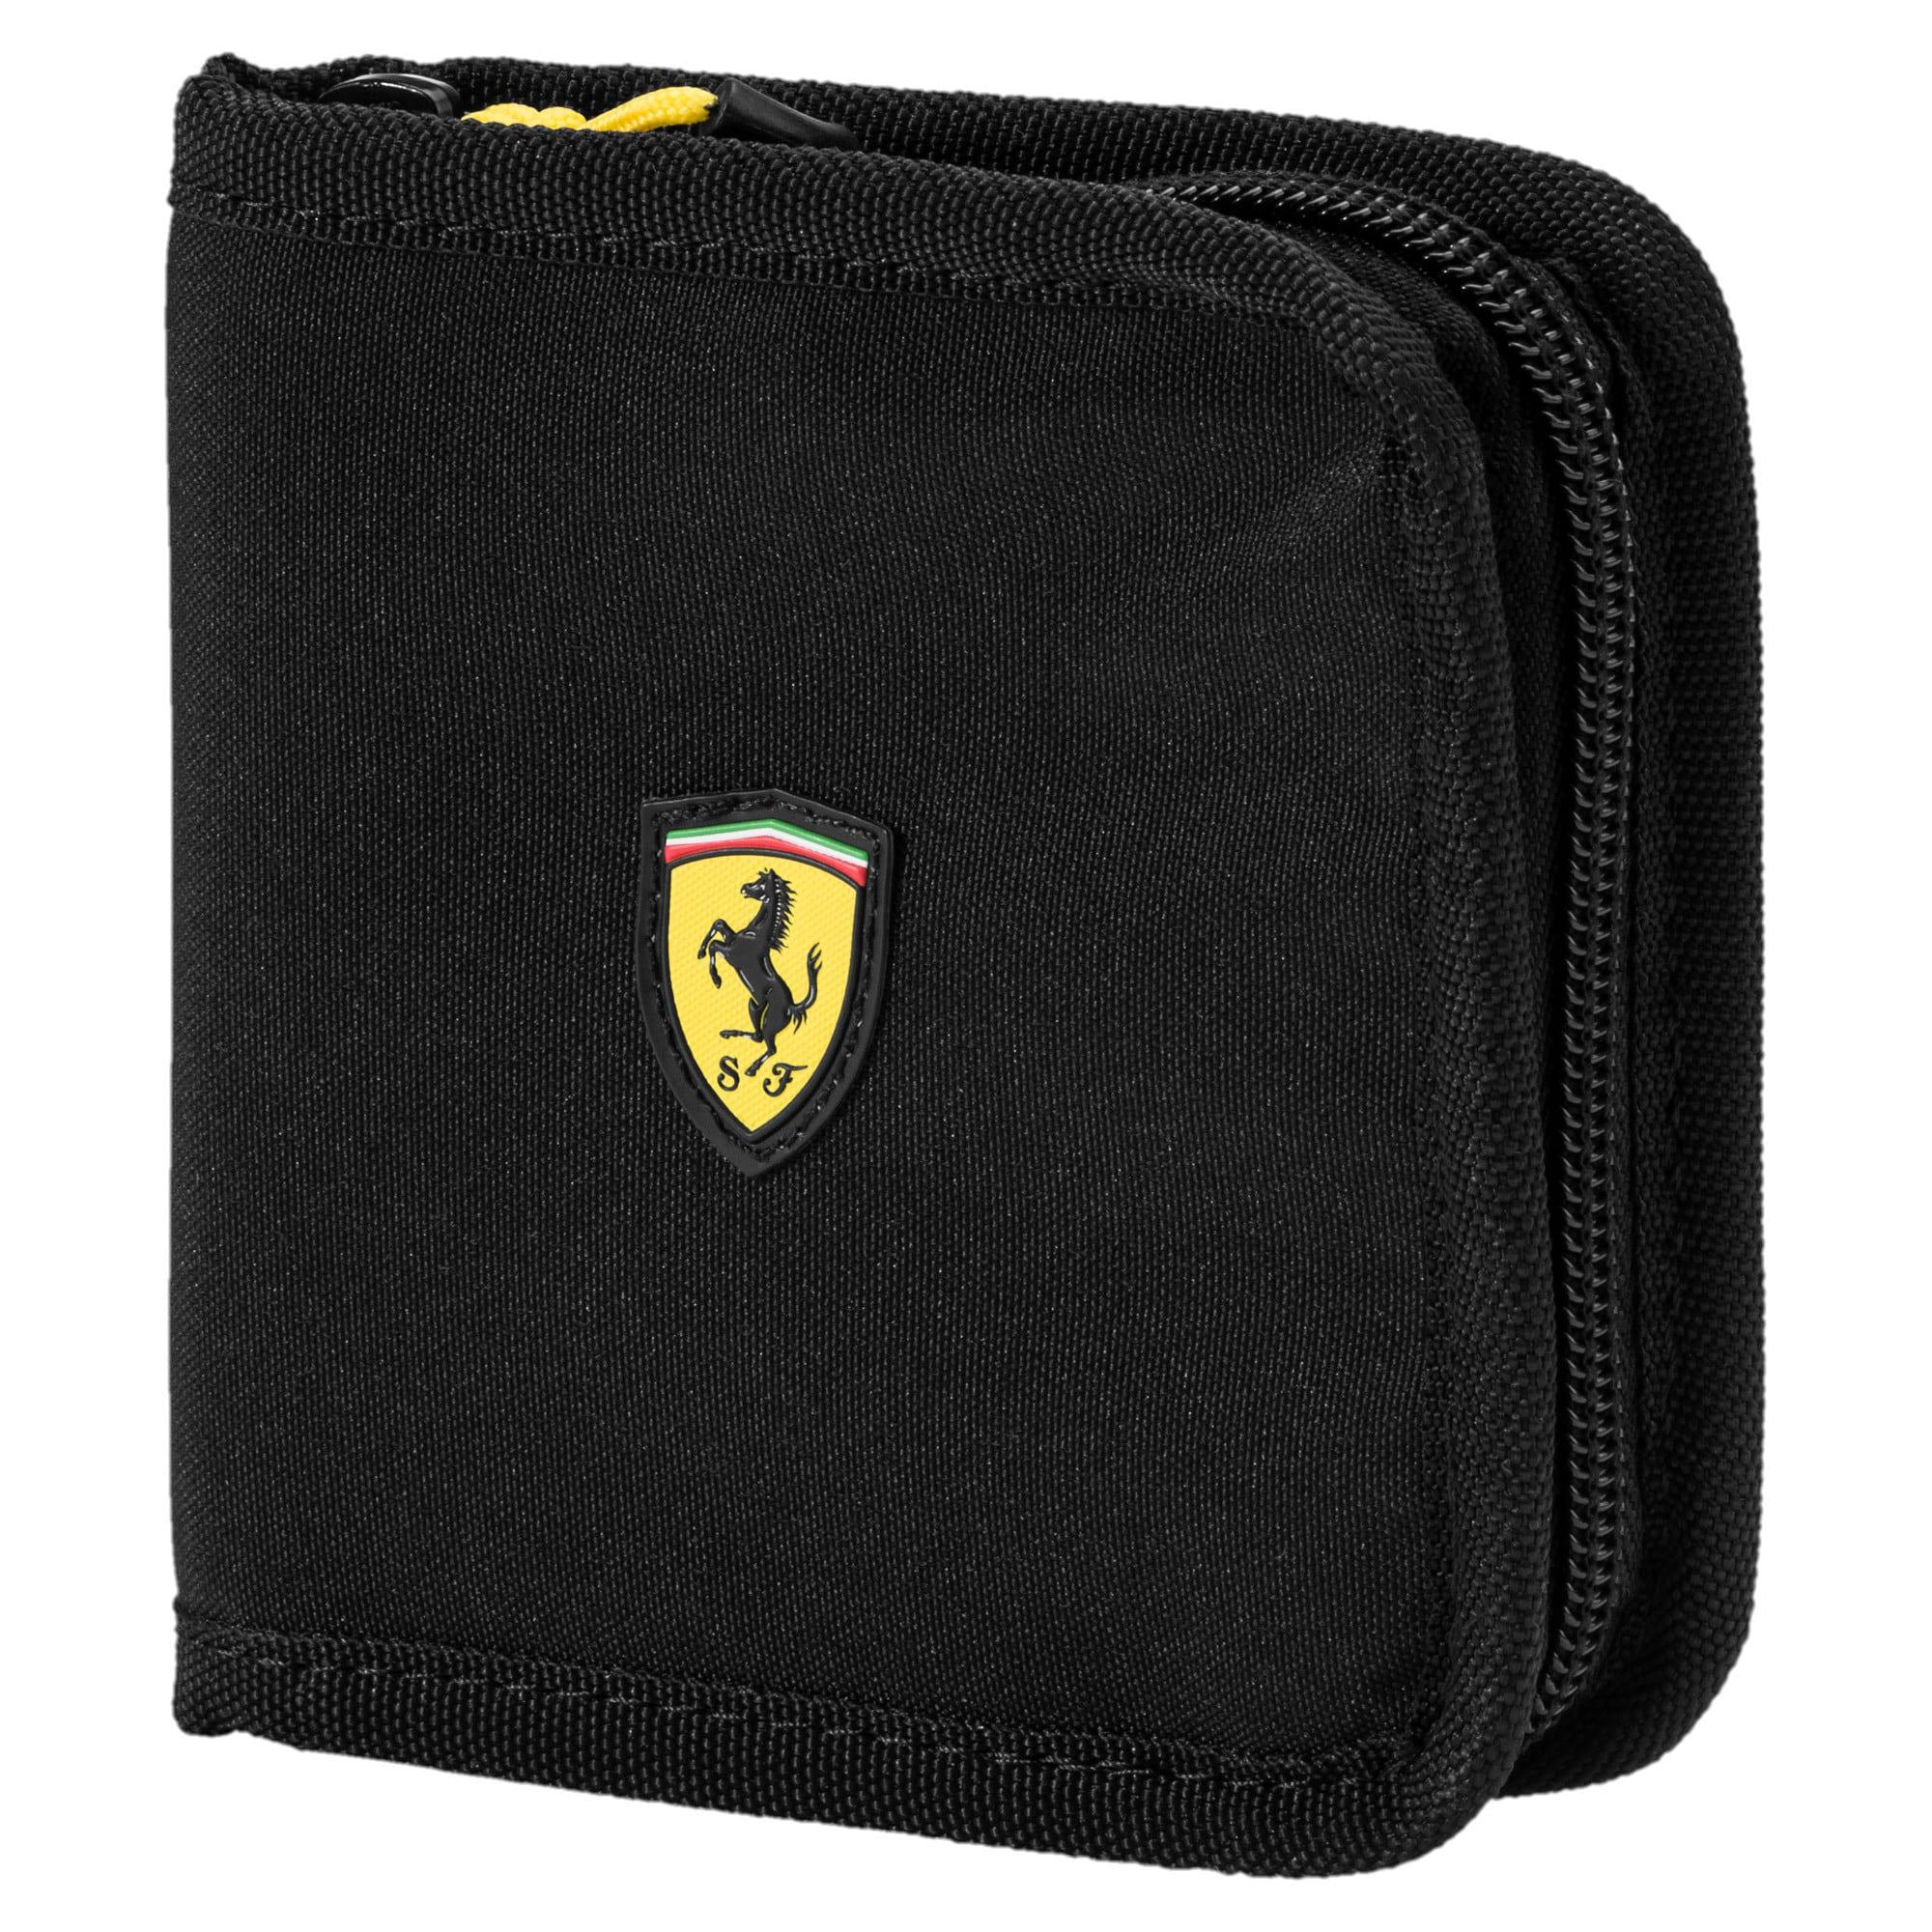 Thumbnail 1 of Ferrari Fanwear Wallet, Puma Black, medium-IND